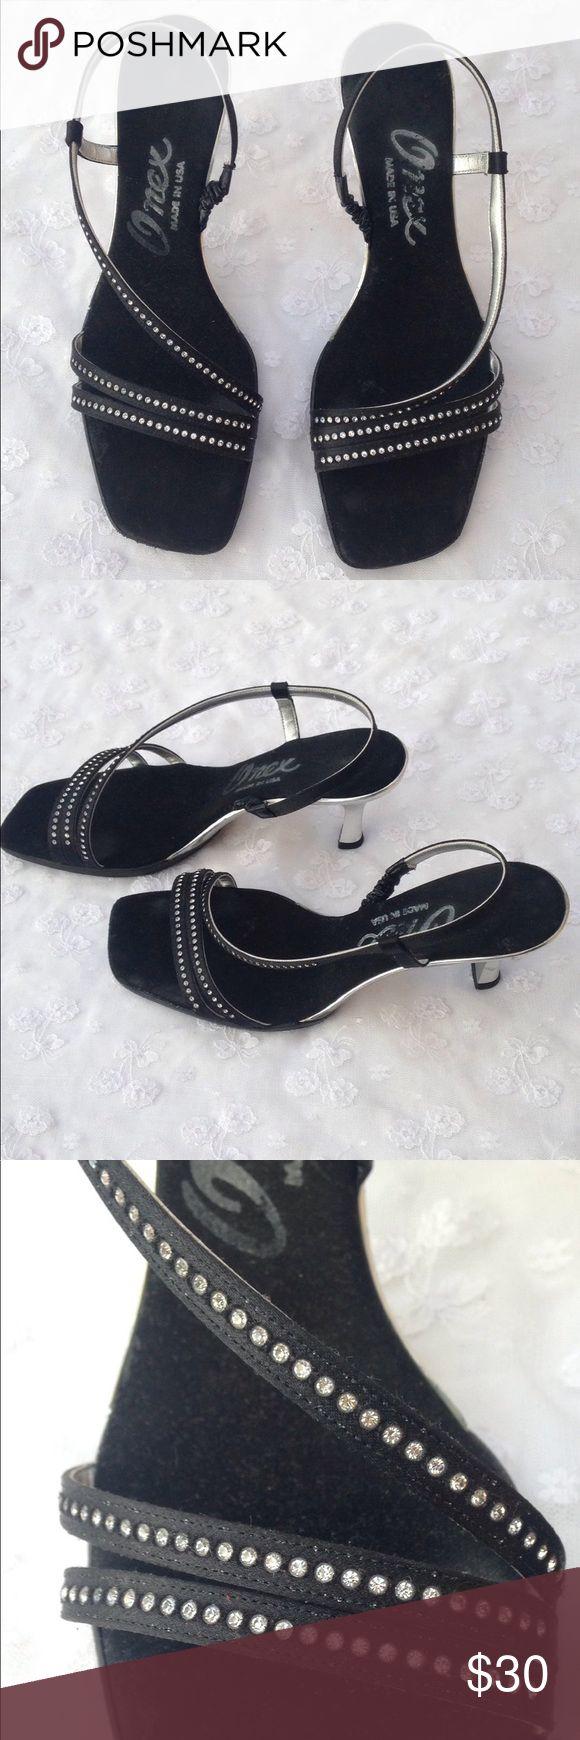 Onex Rhinestone Kitten Heel Sandals Cute black satin rhinestone sandals with silver kitten heels and silver bottoms Onex Shoes